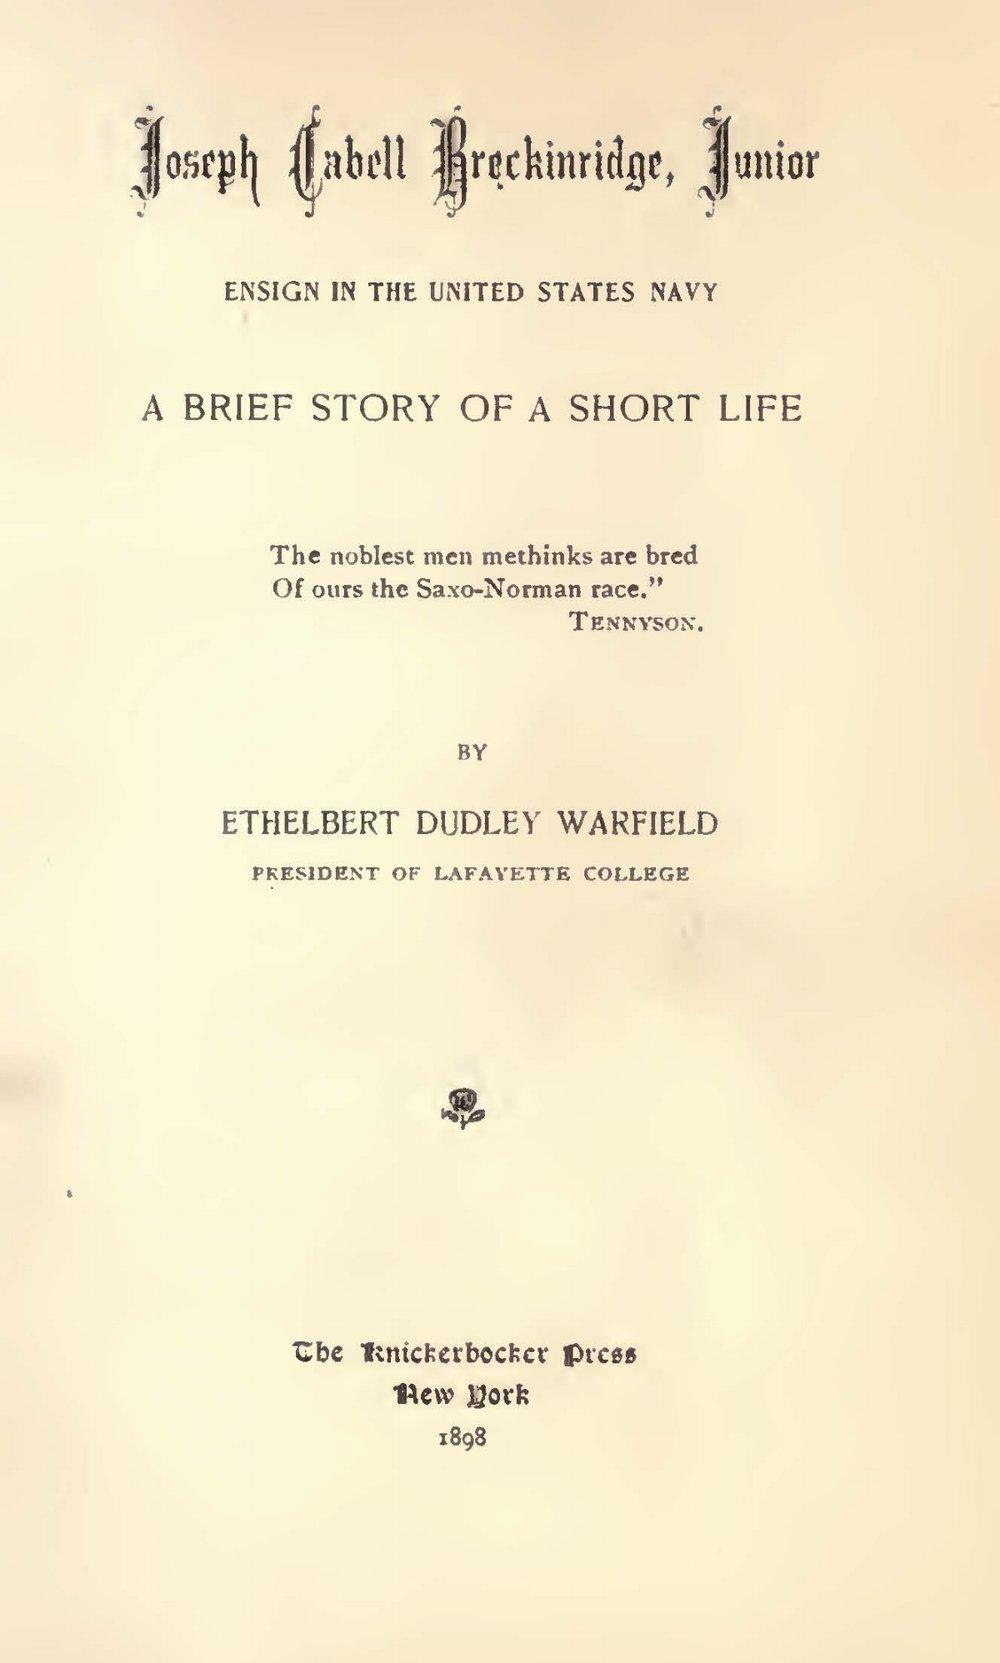 Warfield, Ethelbert Dudley, Joseph Cabell Breckinridge, Jr. Title Page.jpg